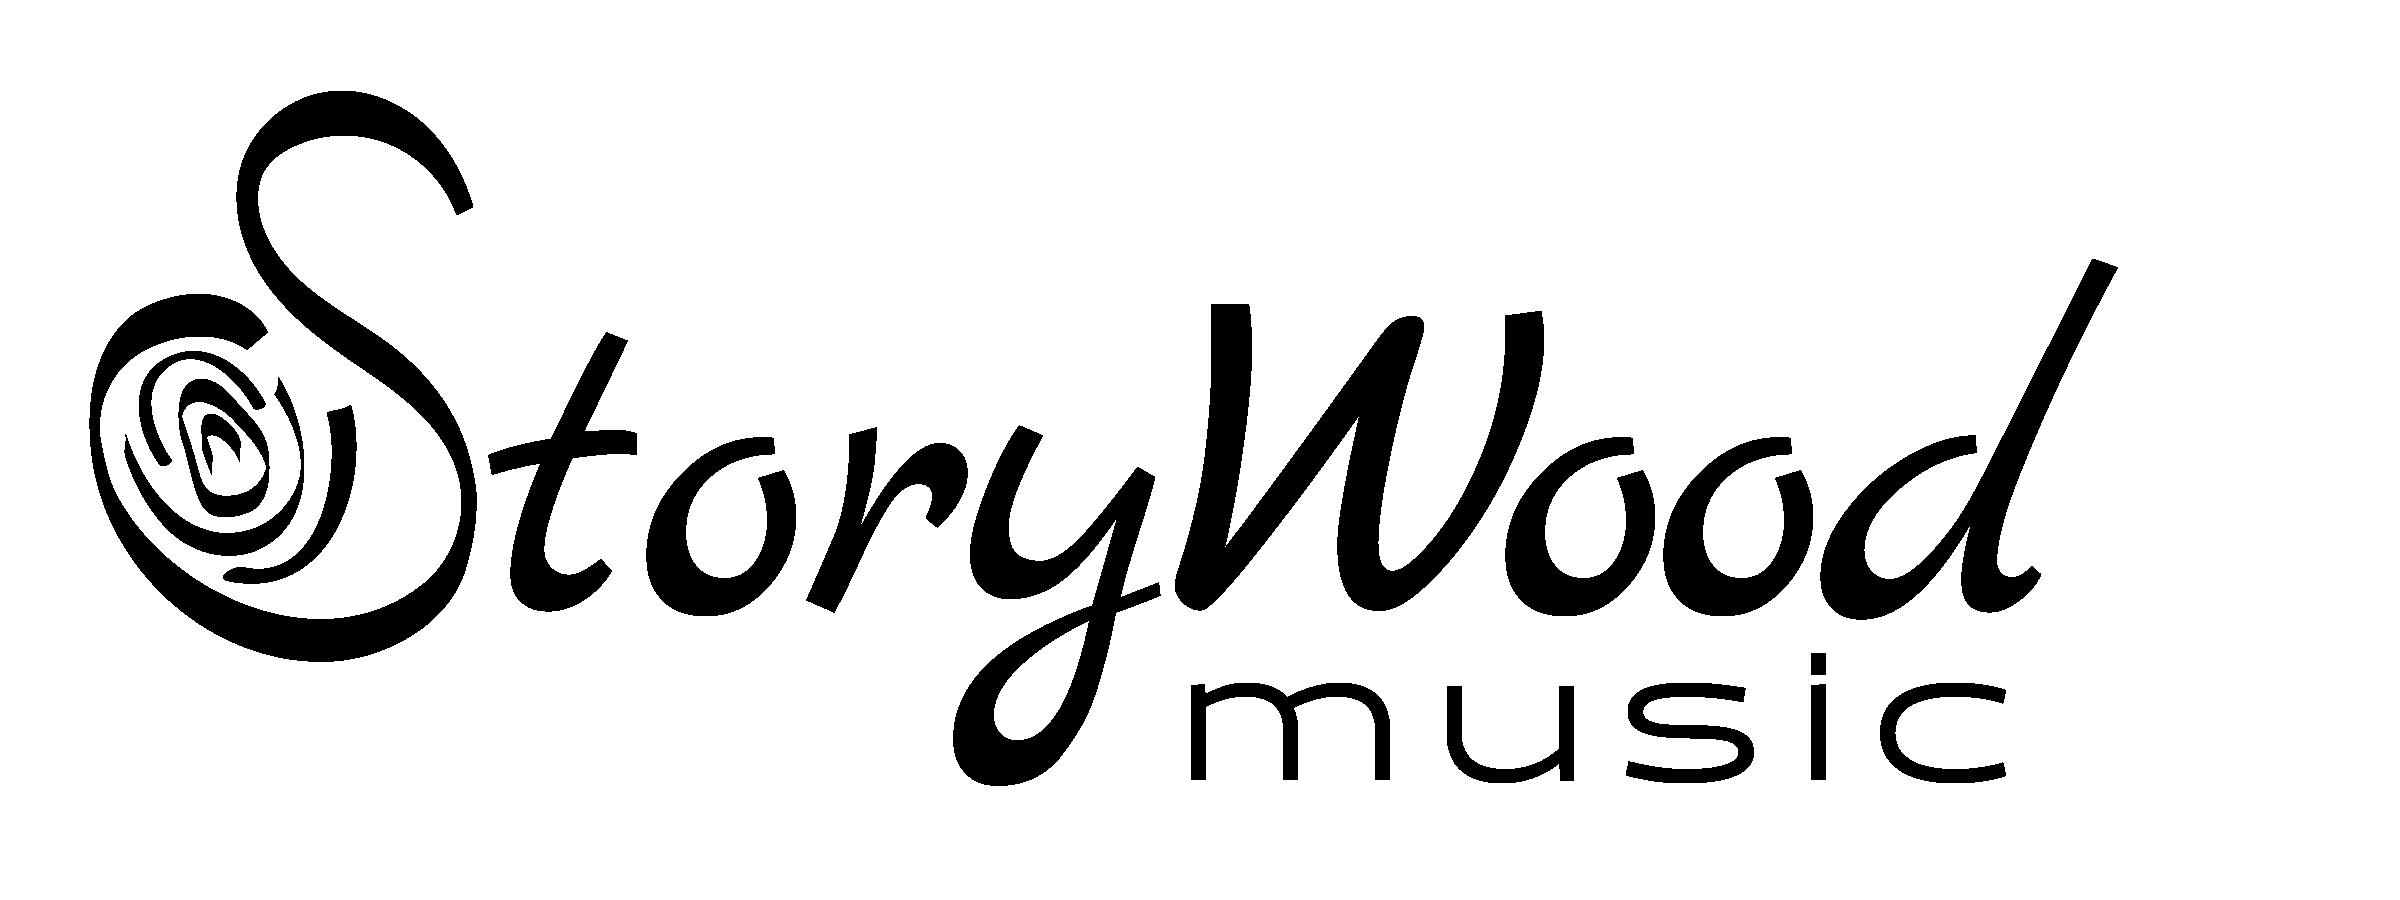 StoryWoodMusic Logo